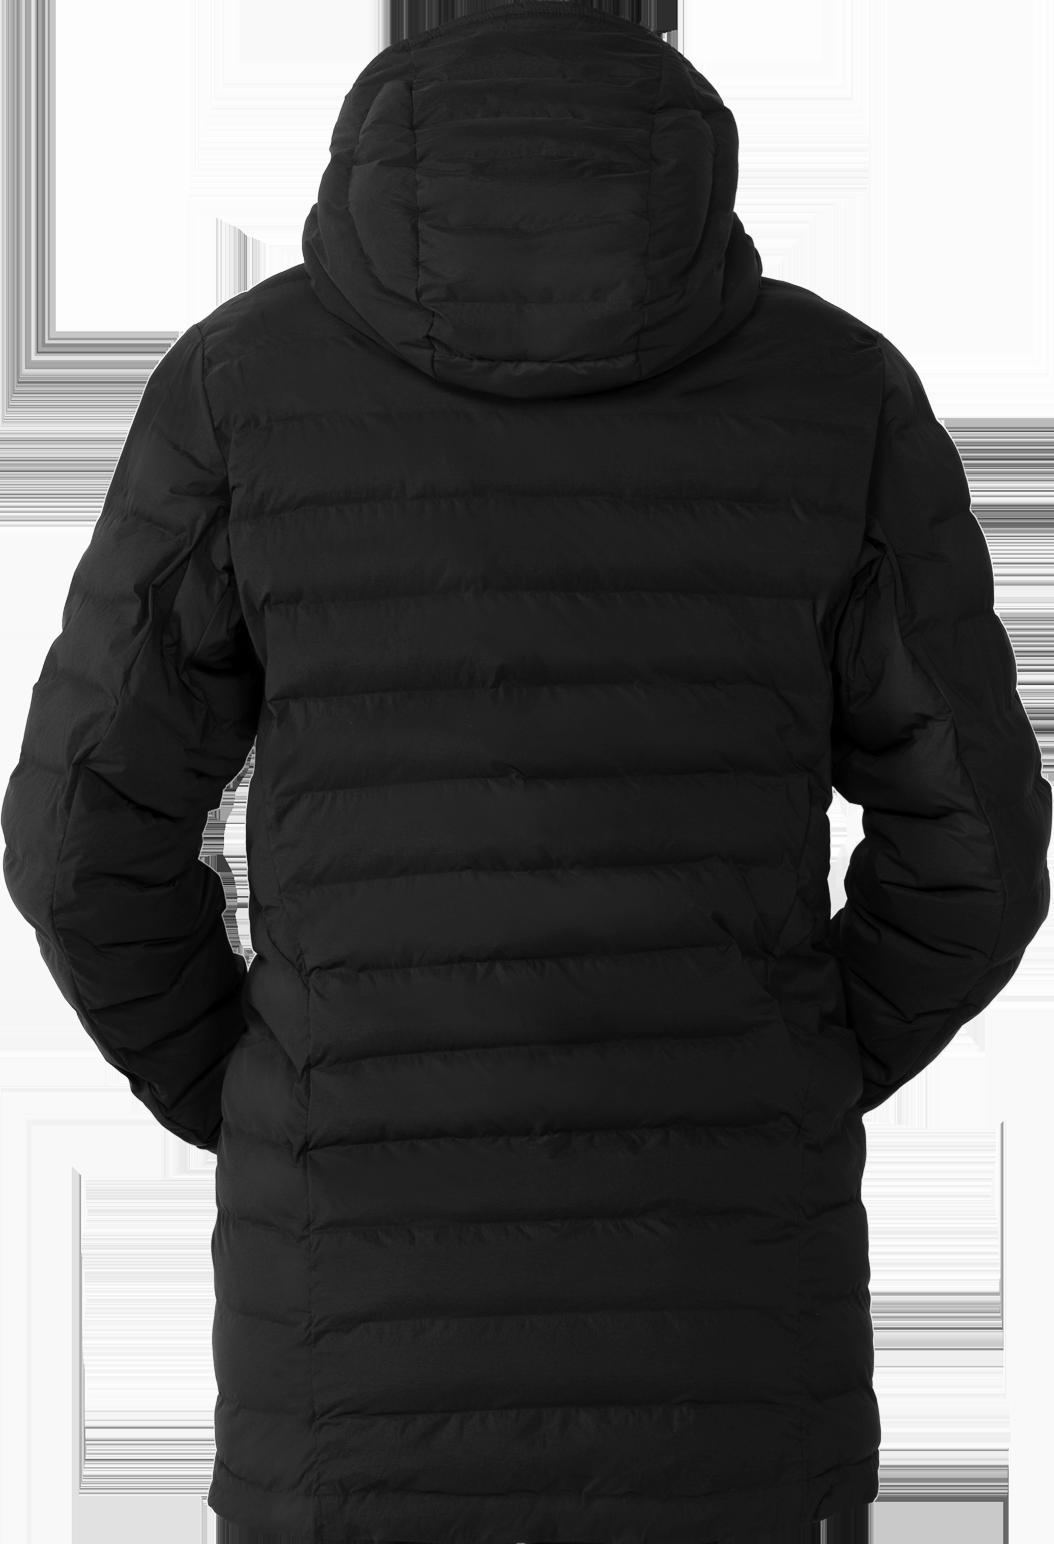 498af9fa5d2f Open One - Insulator Jacket - Women - Black